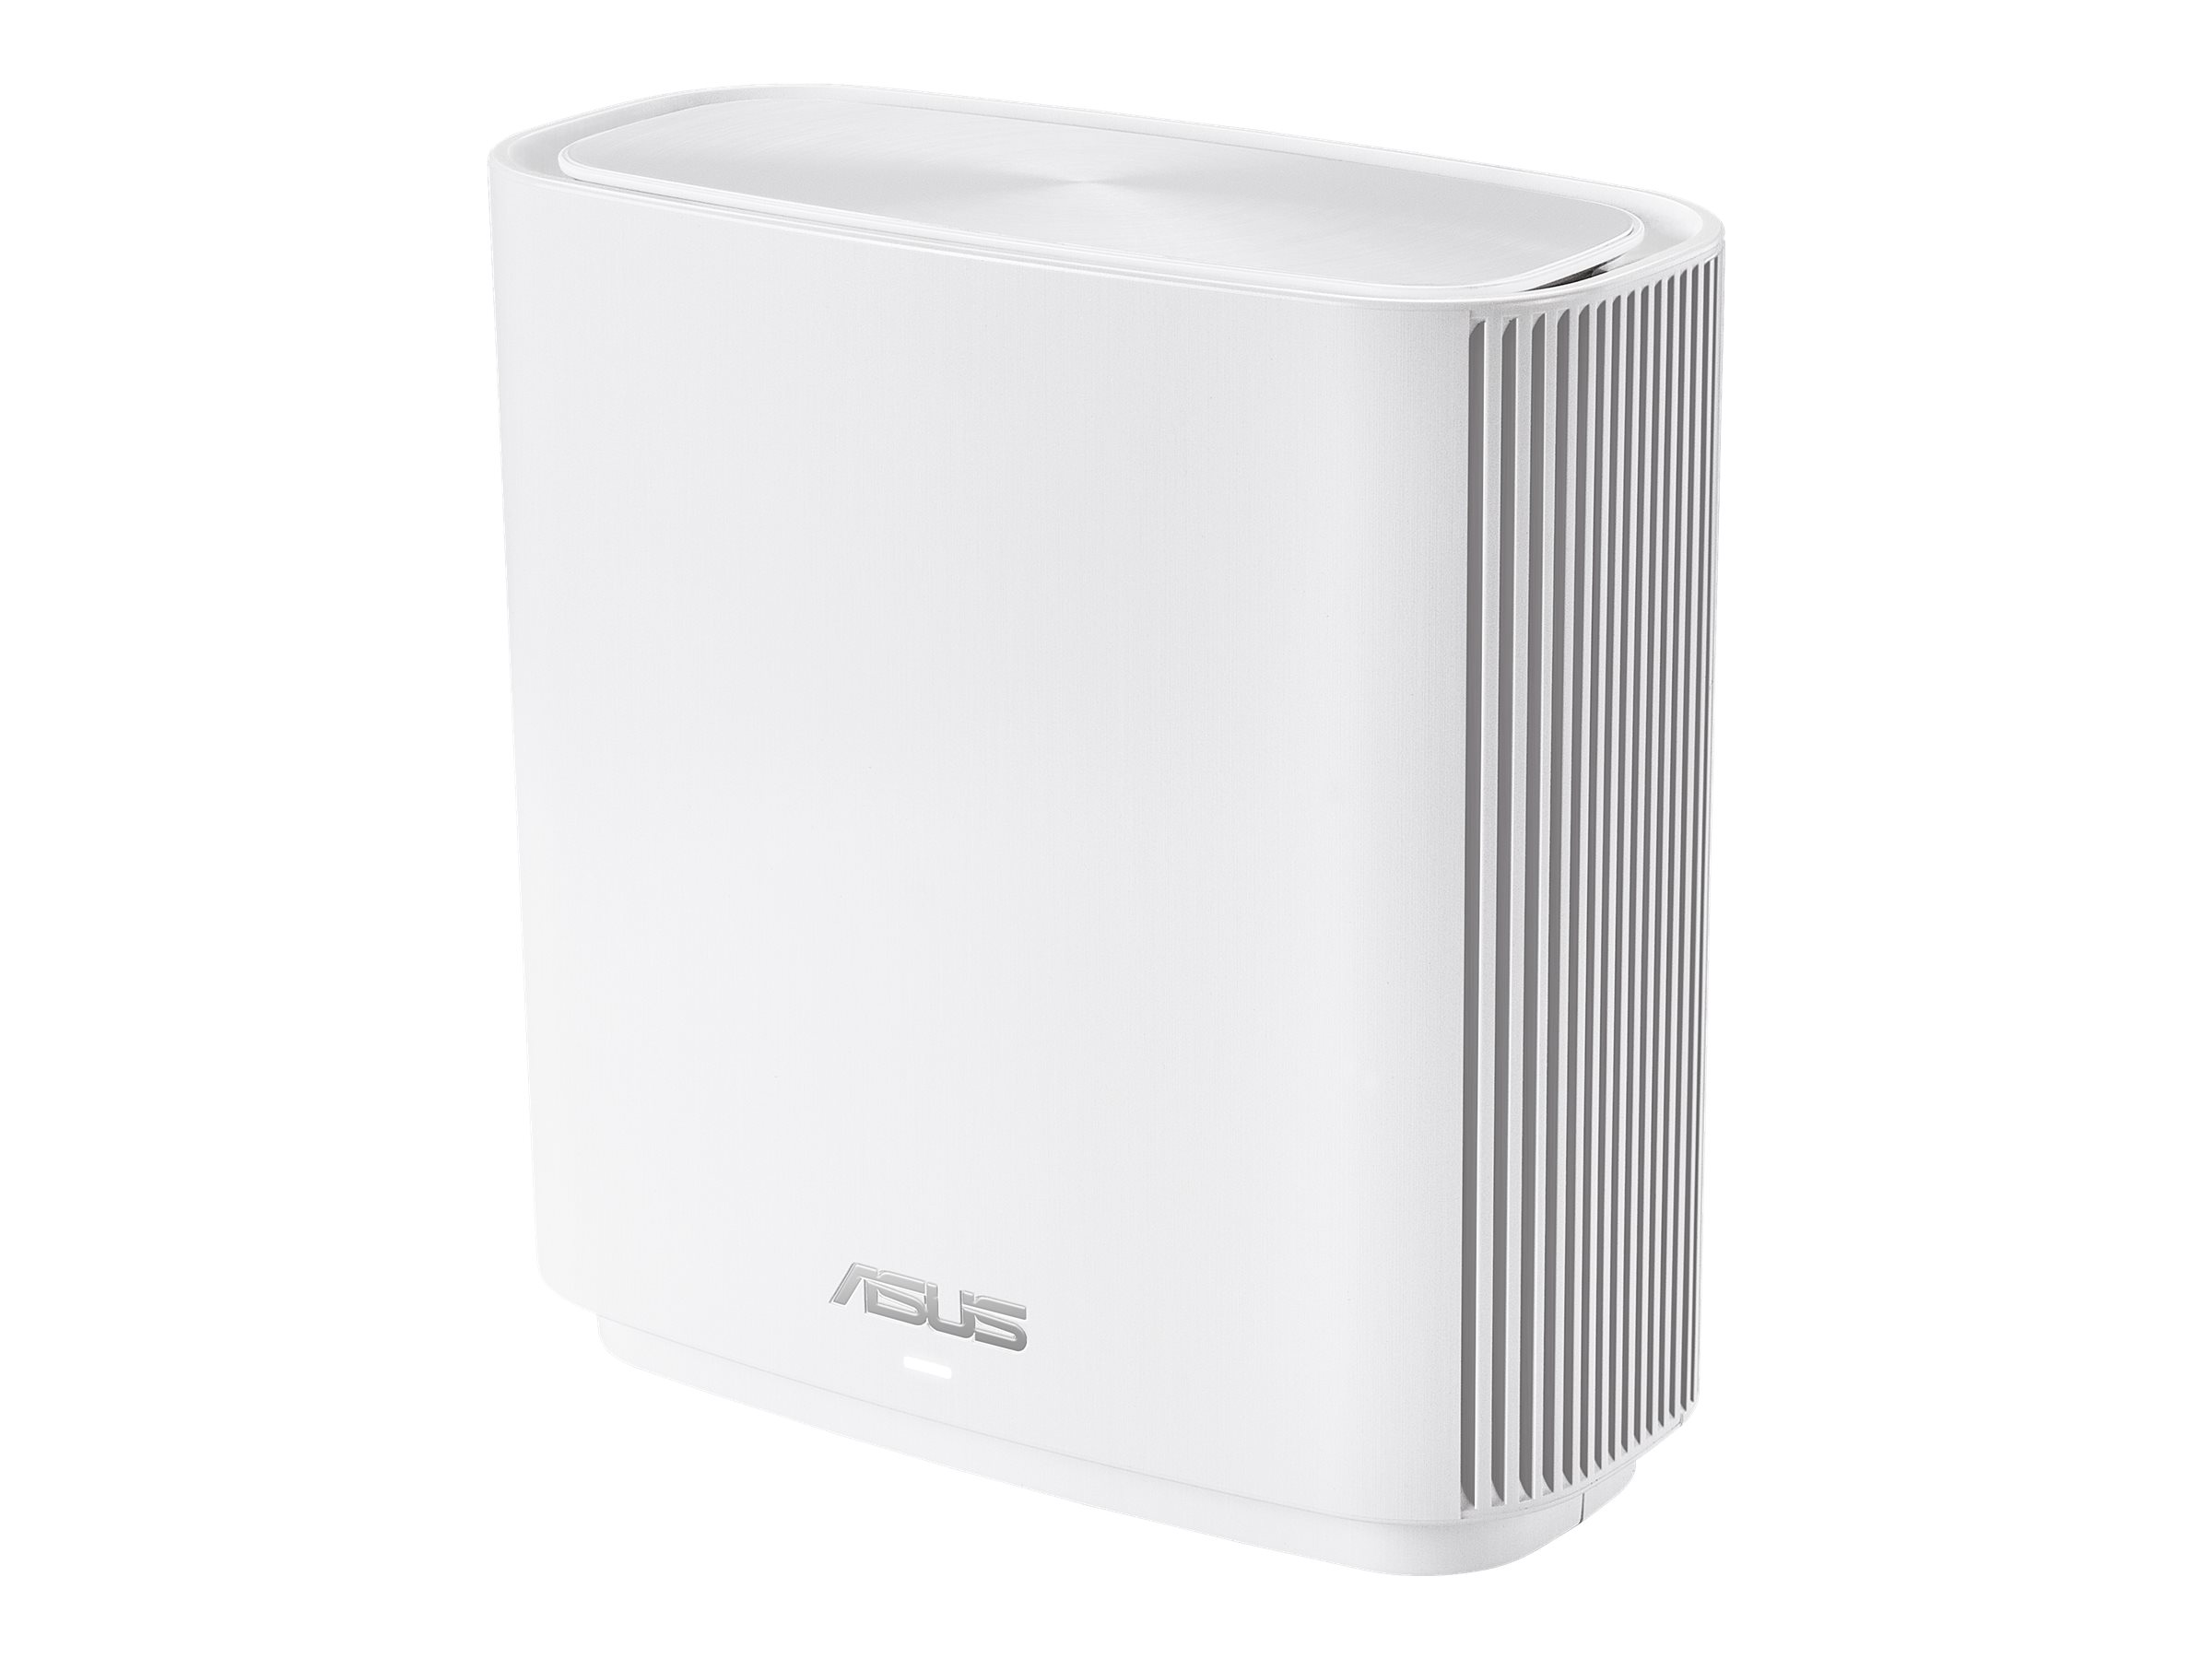 Vorschau: ASUS ZenWiFi AC (CT8) - Router - 3-Port-Switch